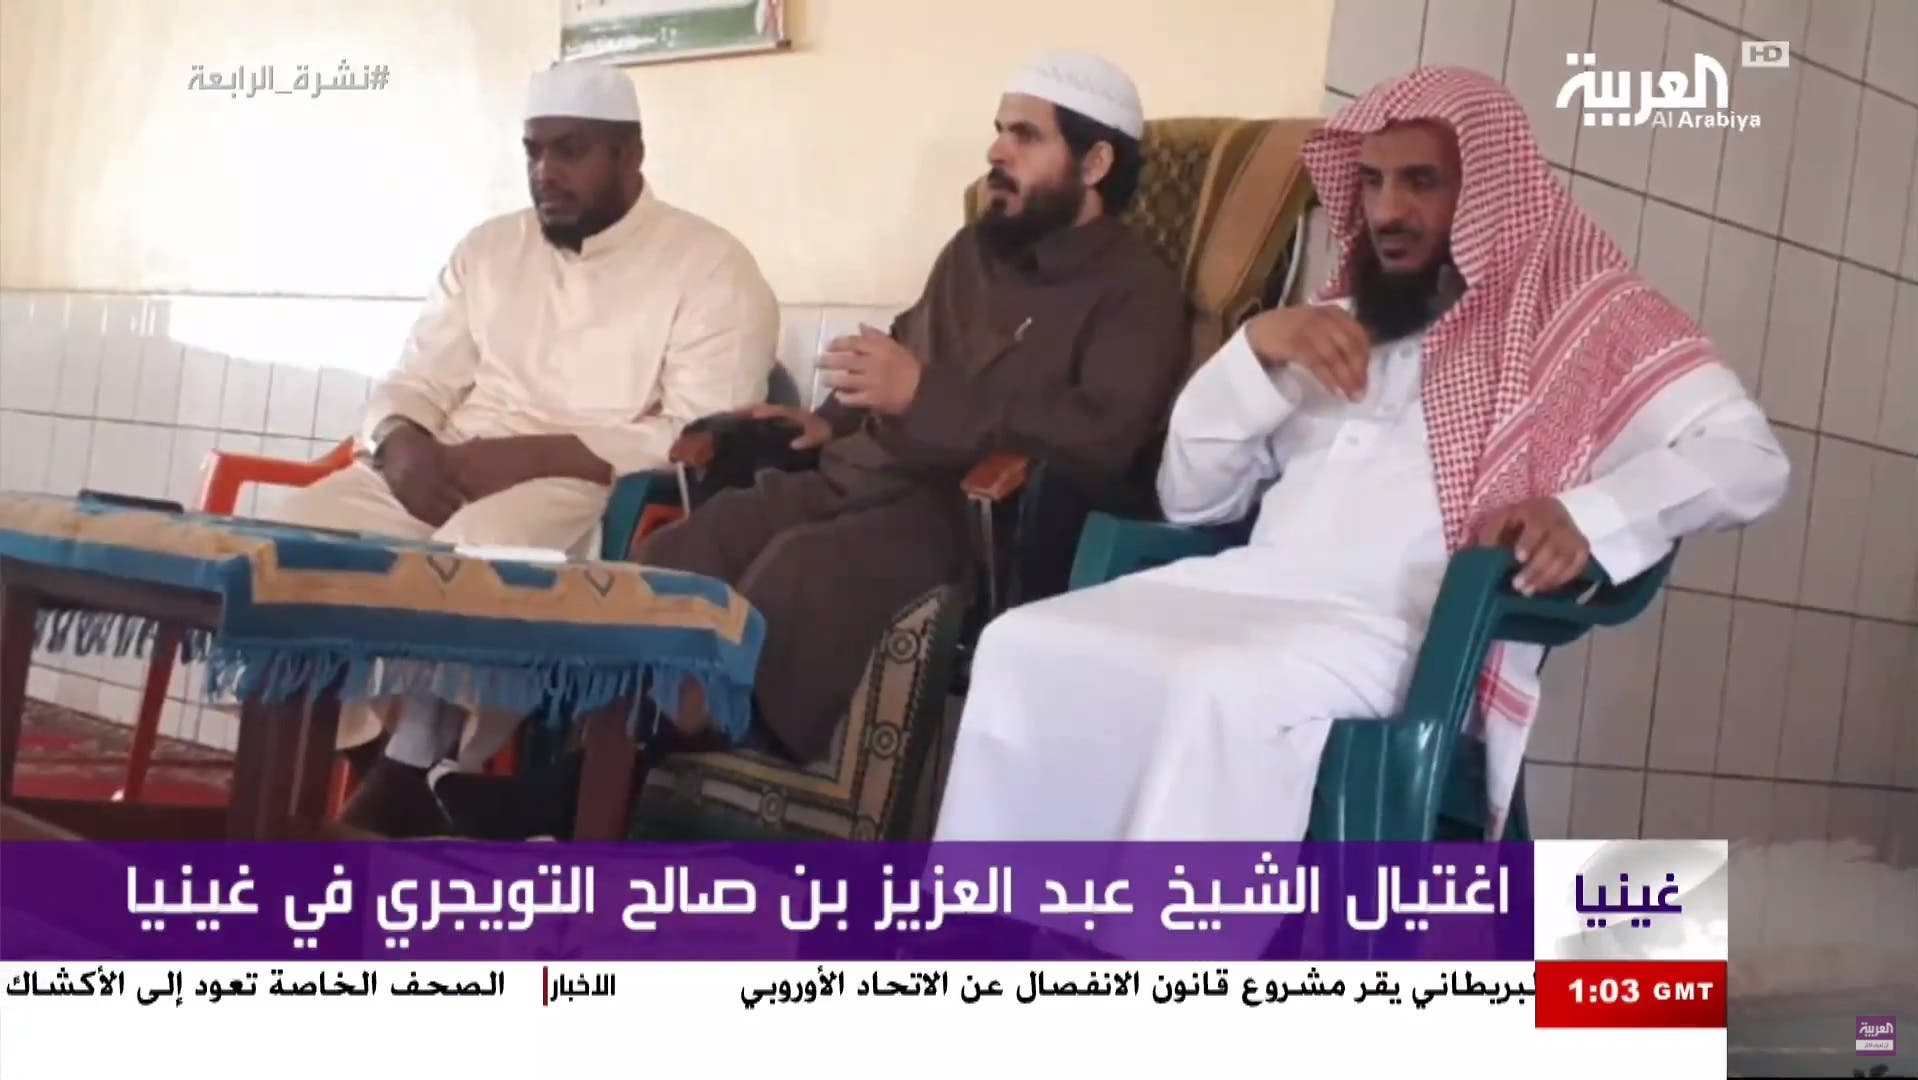 Details emerge surrounding murder of Saudi preacher in Guinea